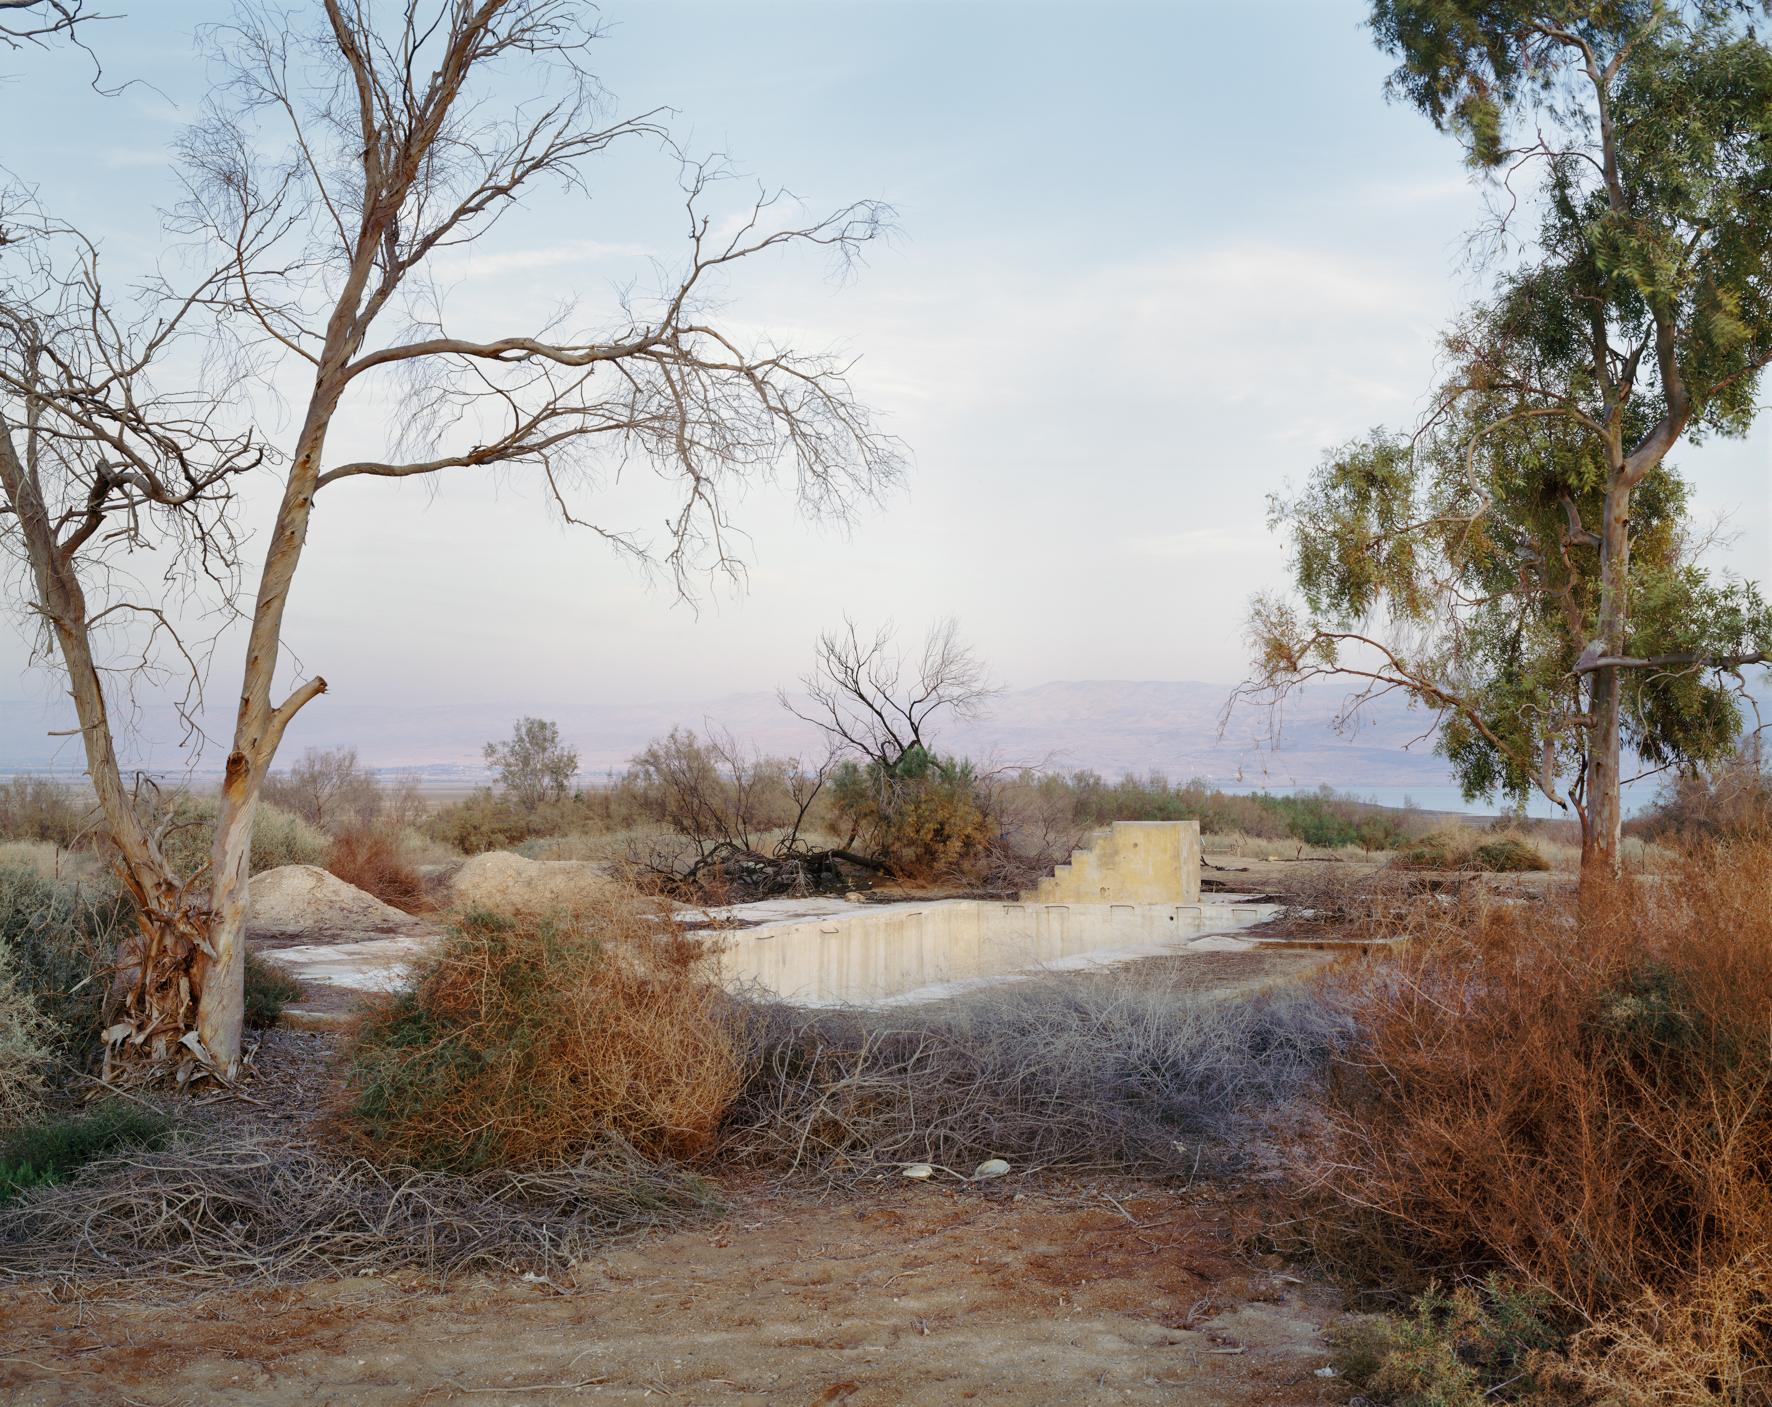 Swimming Pool, Northern Judean Desert, 2011. © Yaakov Israel